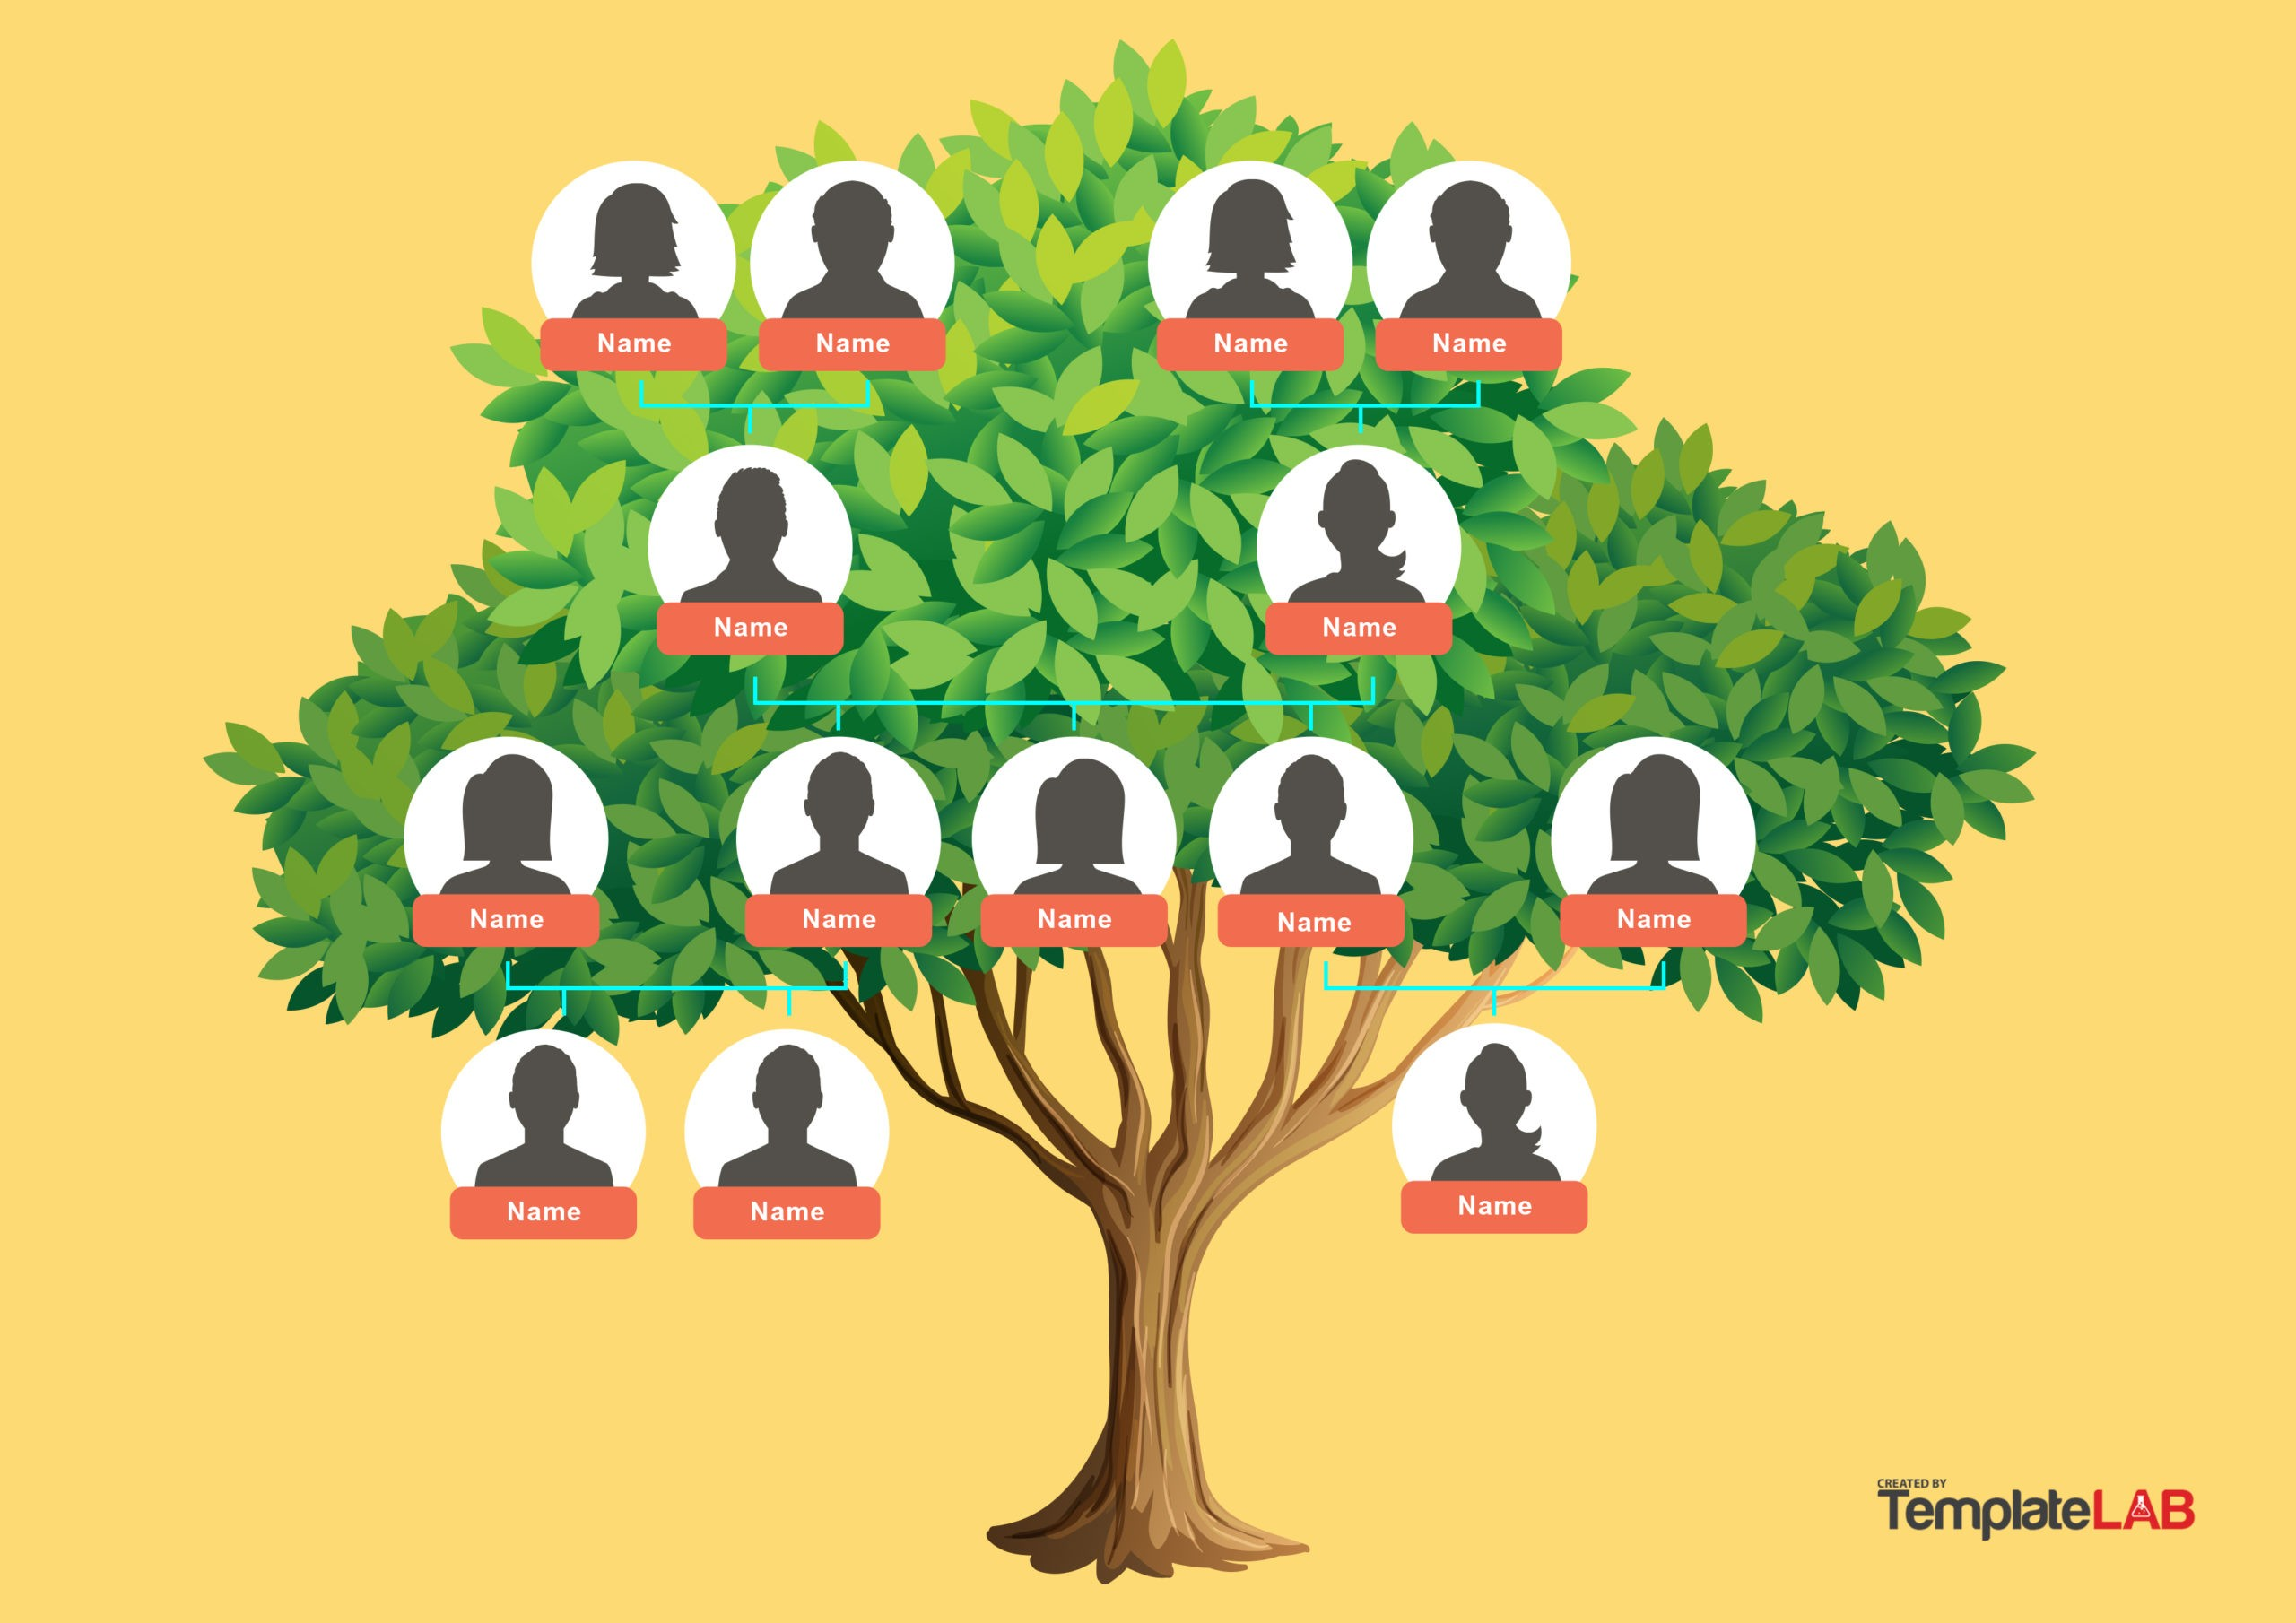 Free Family Tree Template 13 - TemplateLab.com